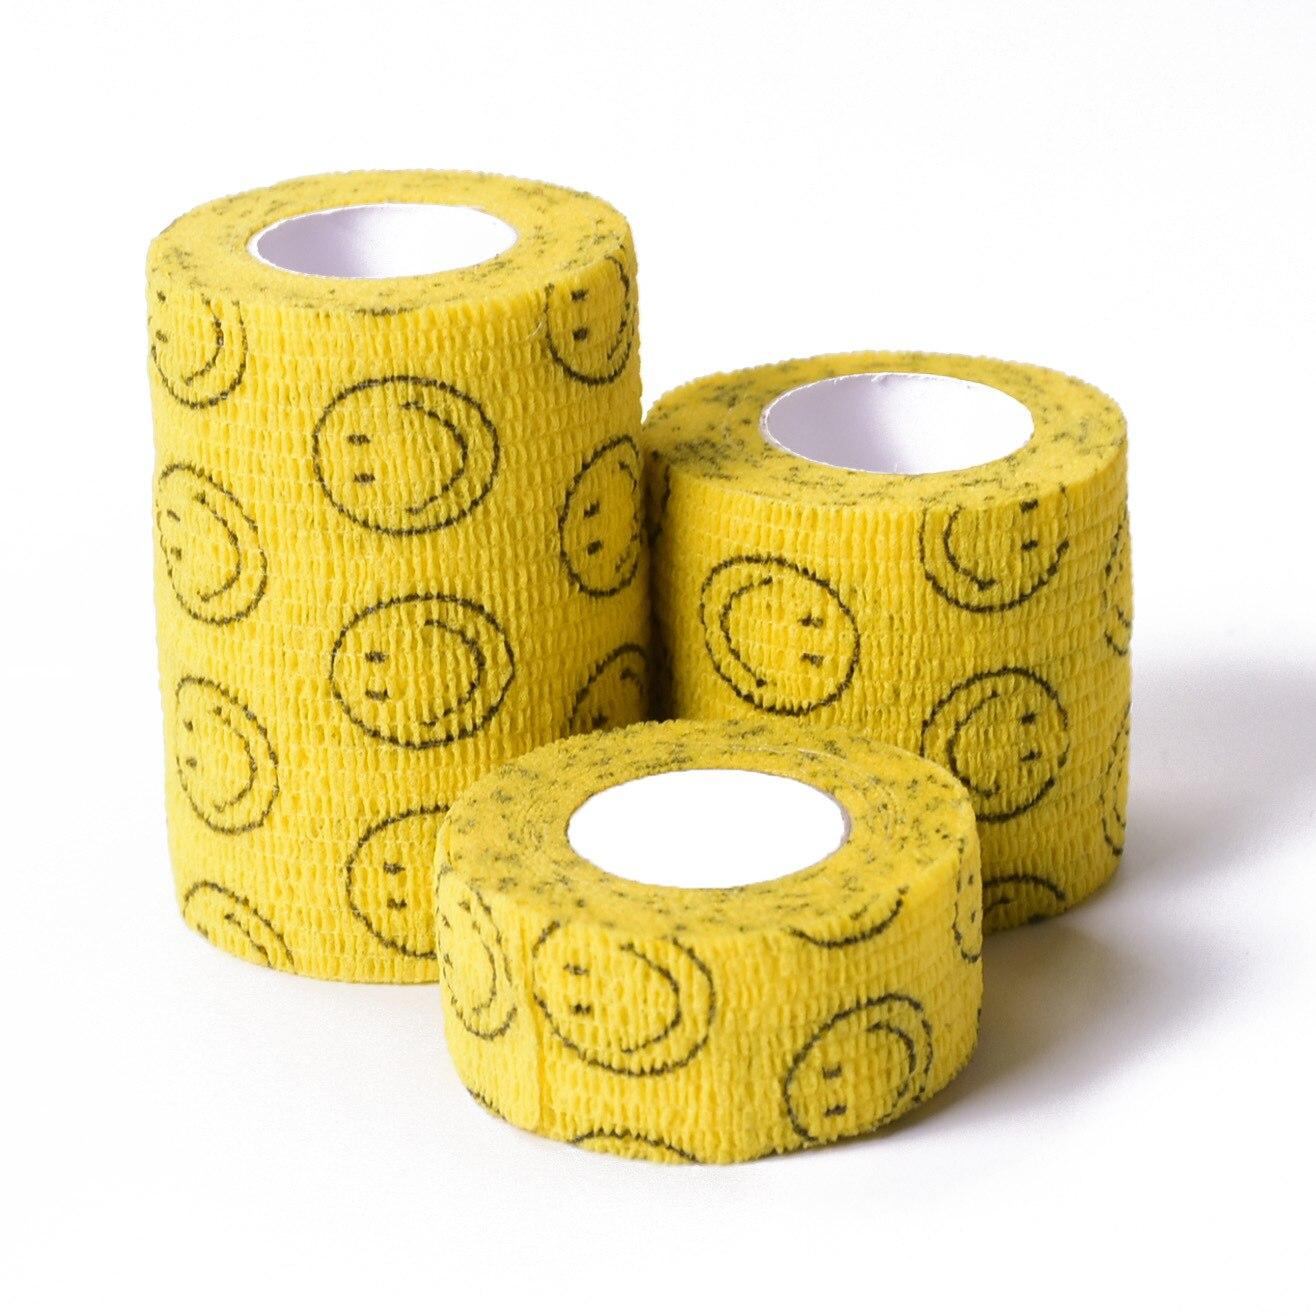 1 Pc Cartoon Tape Waterproof Self Adhesive Elastic Bandage Muscle Tape